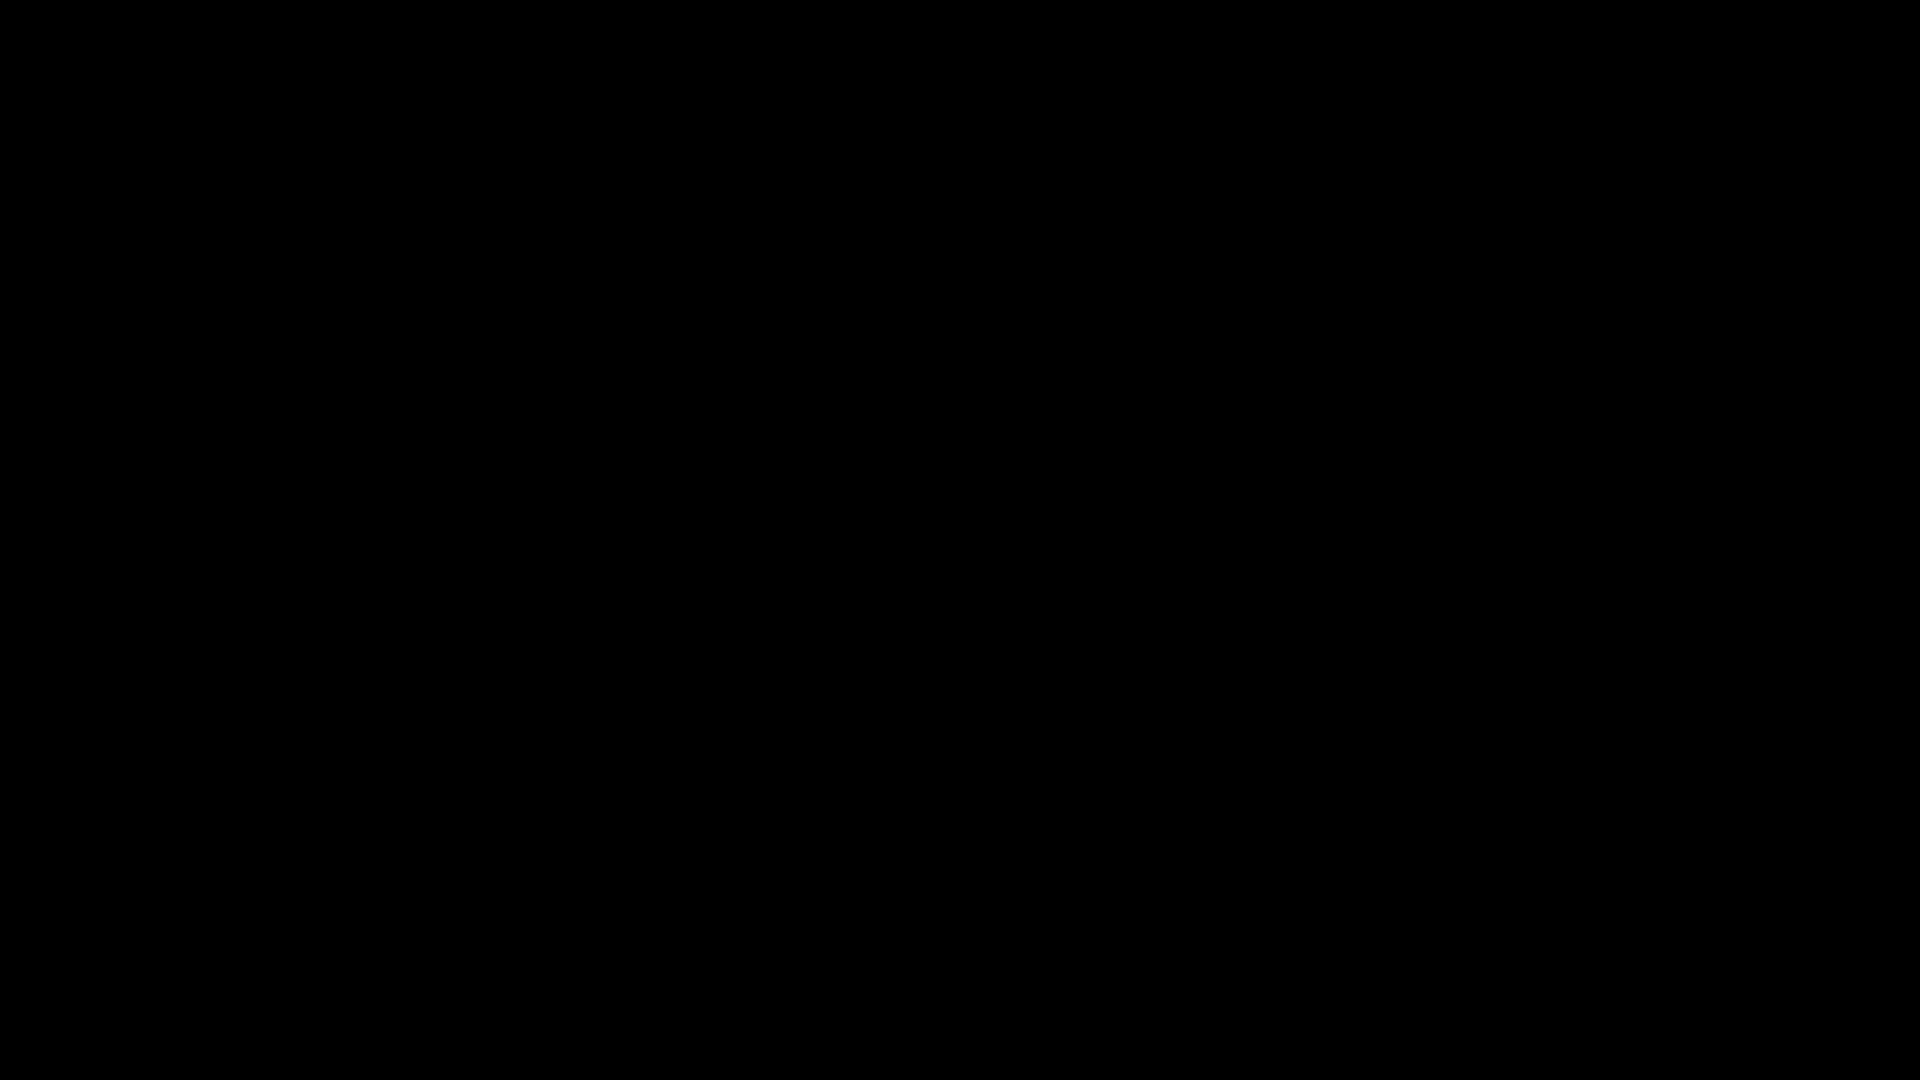 Droog Uv Gemetalliseerde Holografische Zelfklevende Matt Transparante Lamineren Film Gloss Hoge Kwaliteit Bopp Koud Lamineren Film